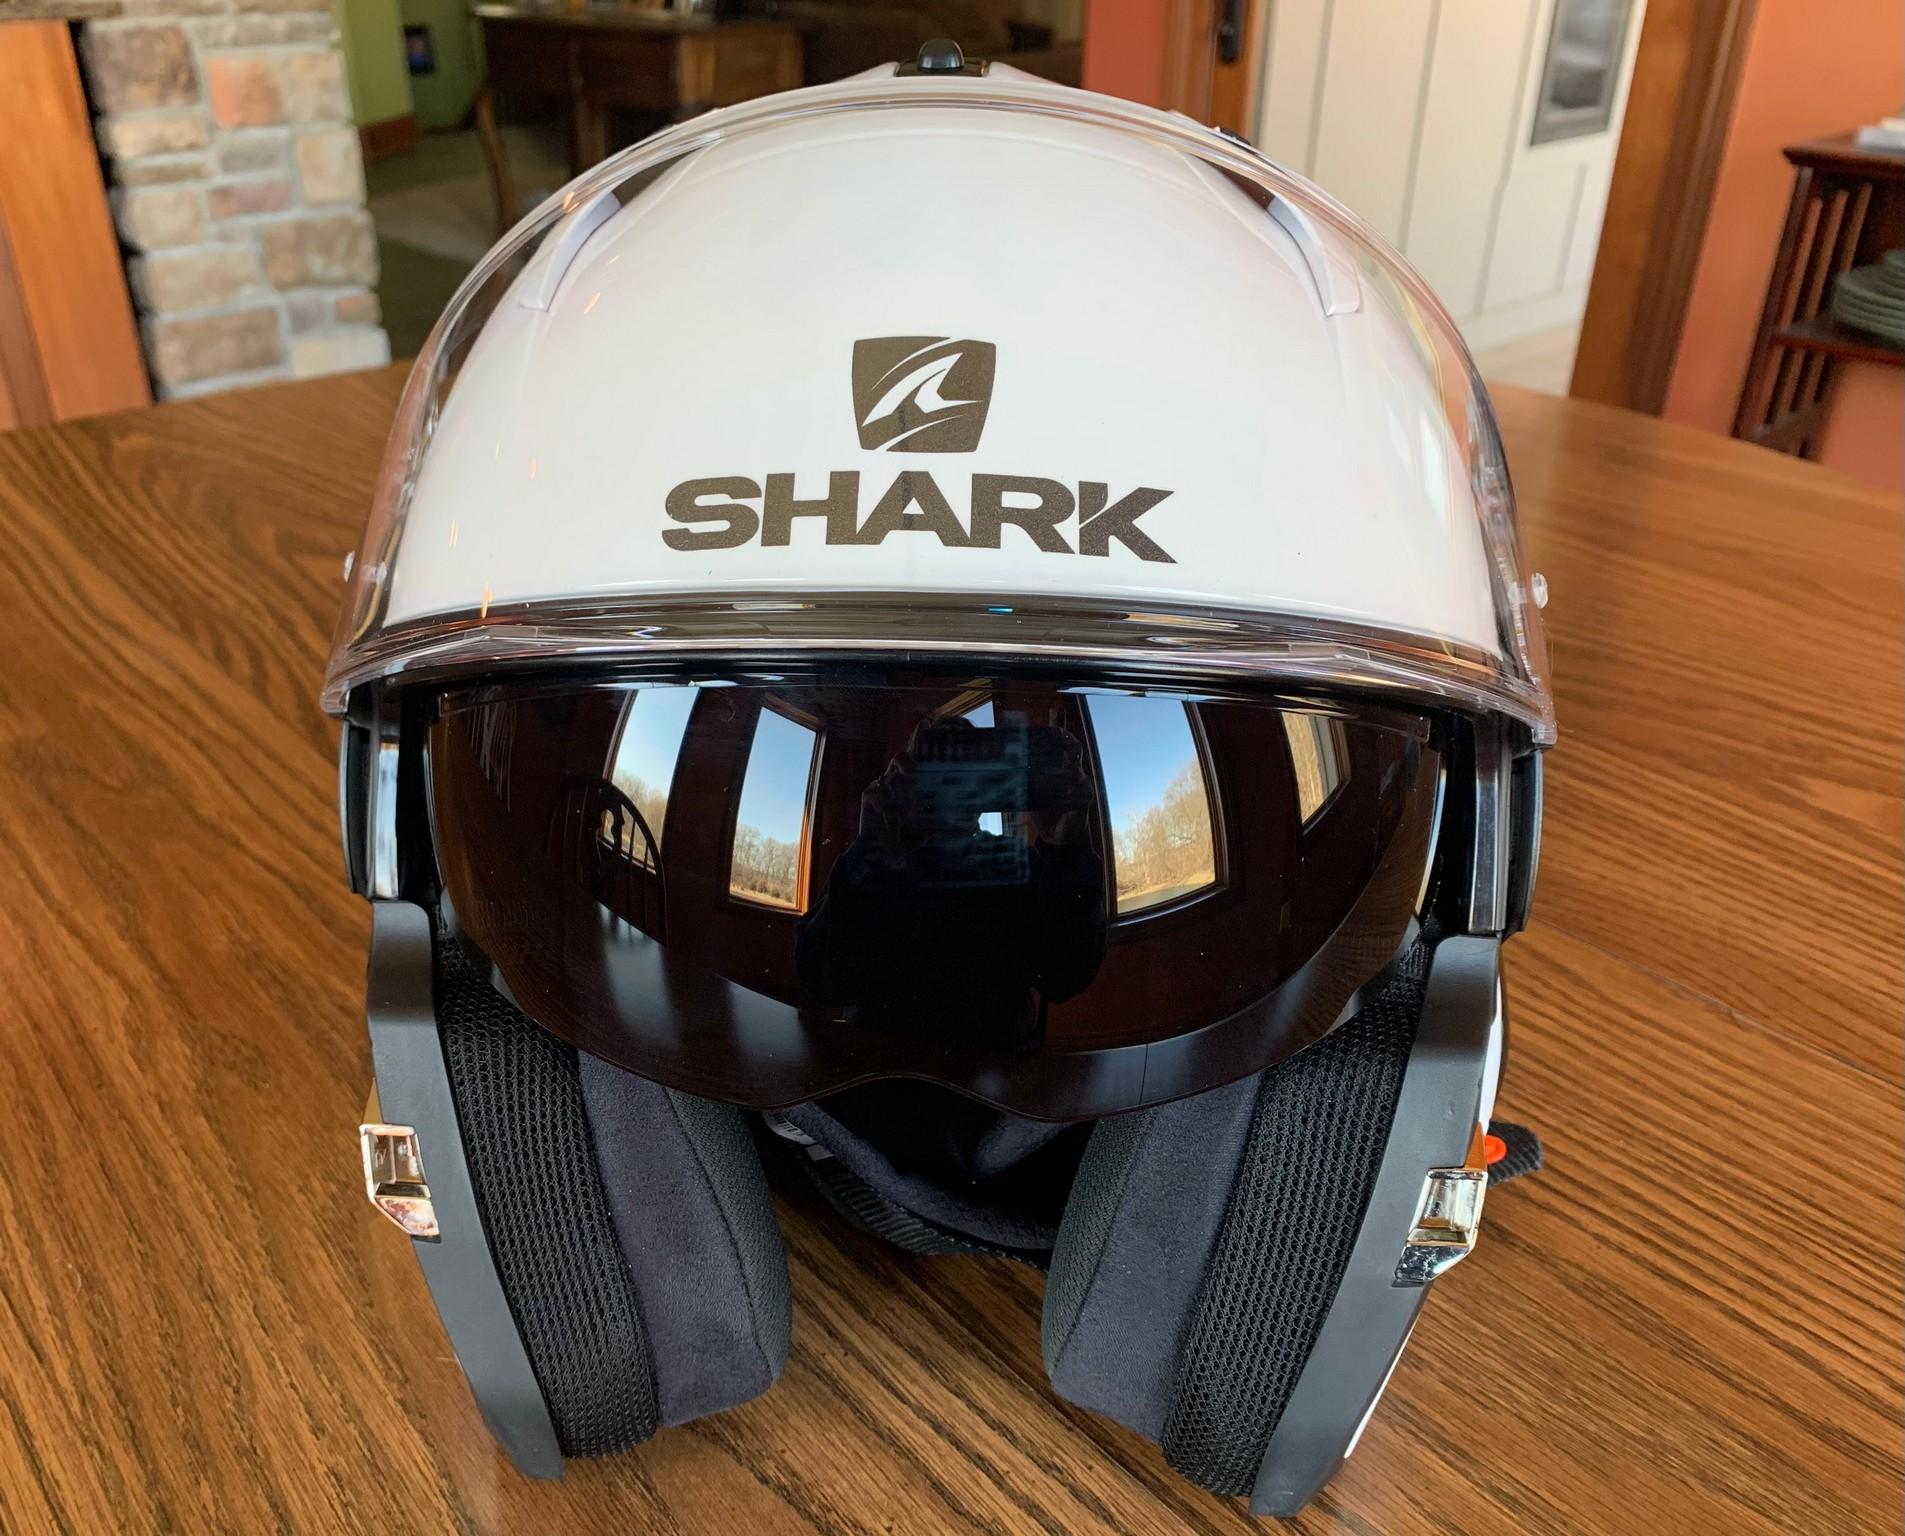 Sun shield on Shark helmet